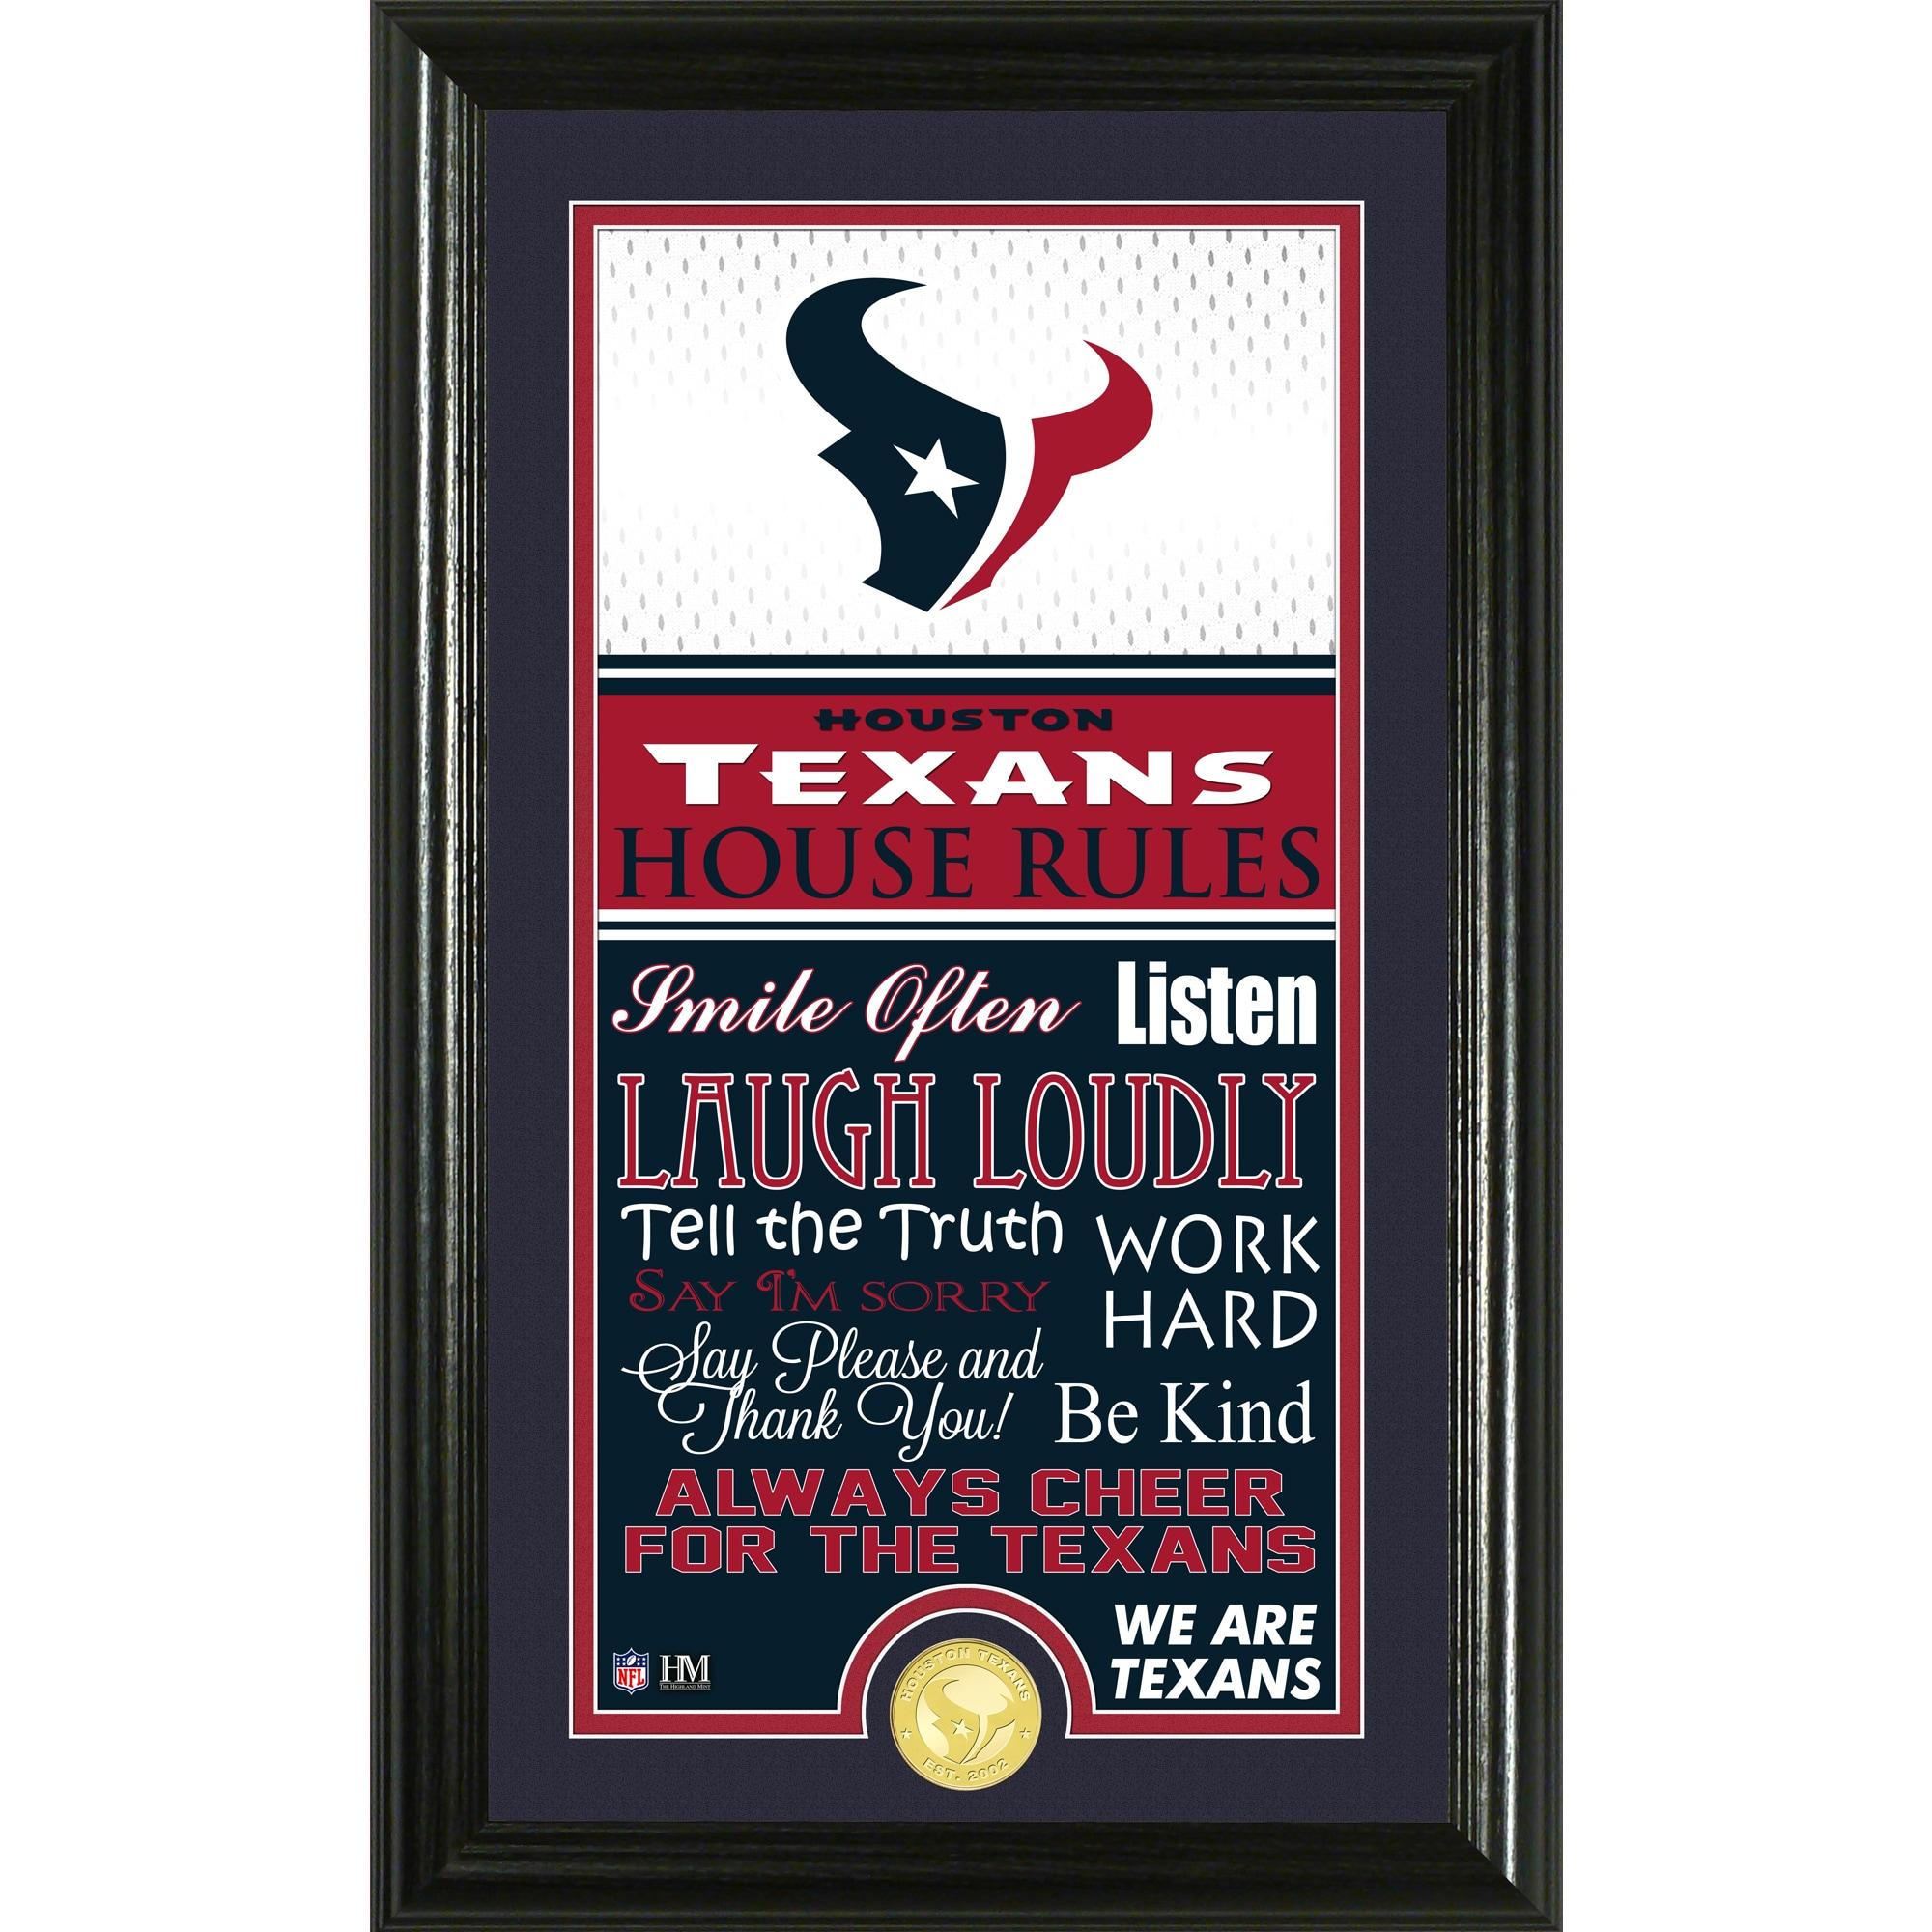 Houston Texans Highland Mint 12'' x 20'' House Rules Supreme Photo Mint